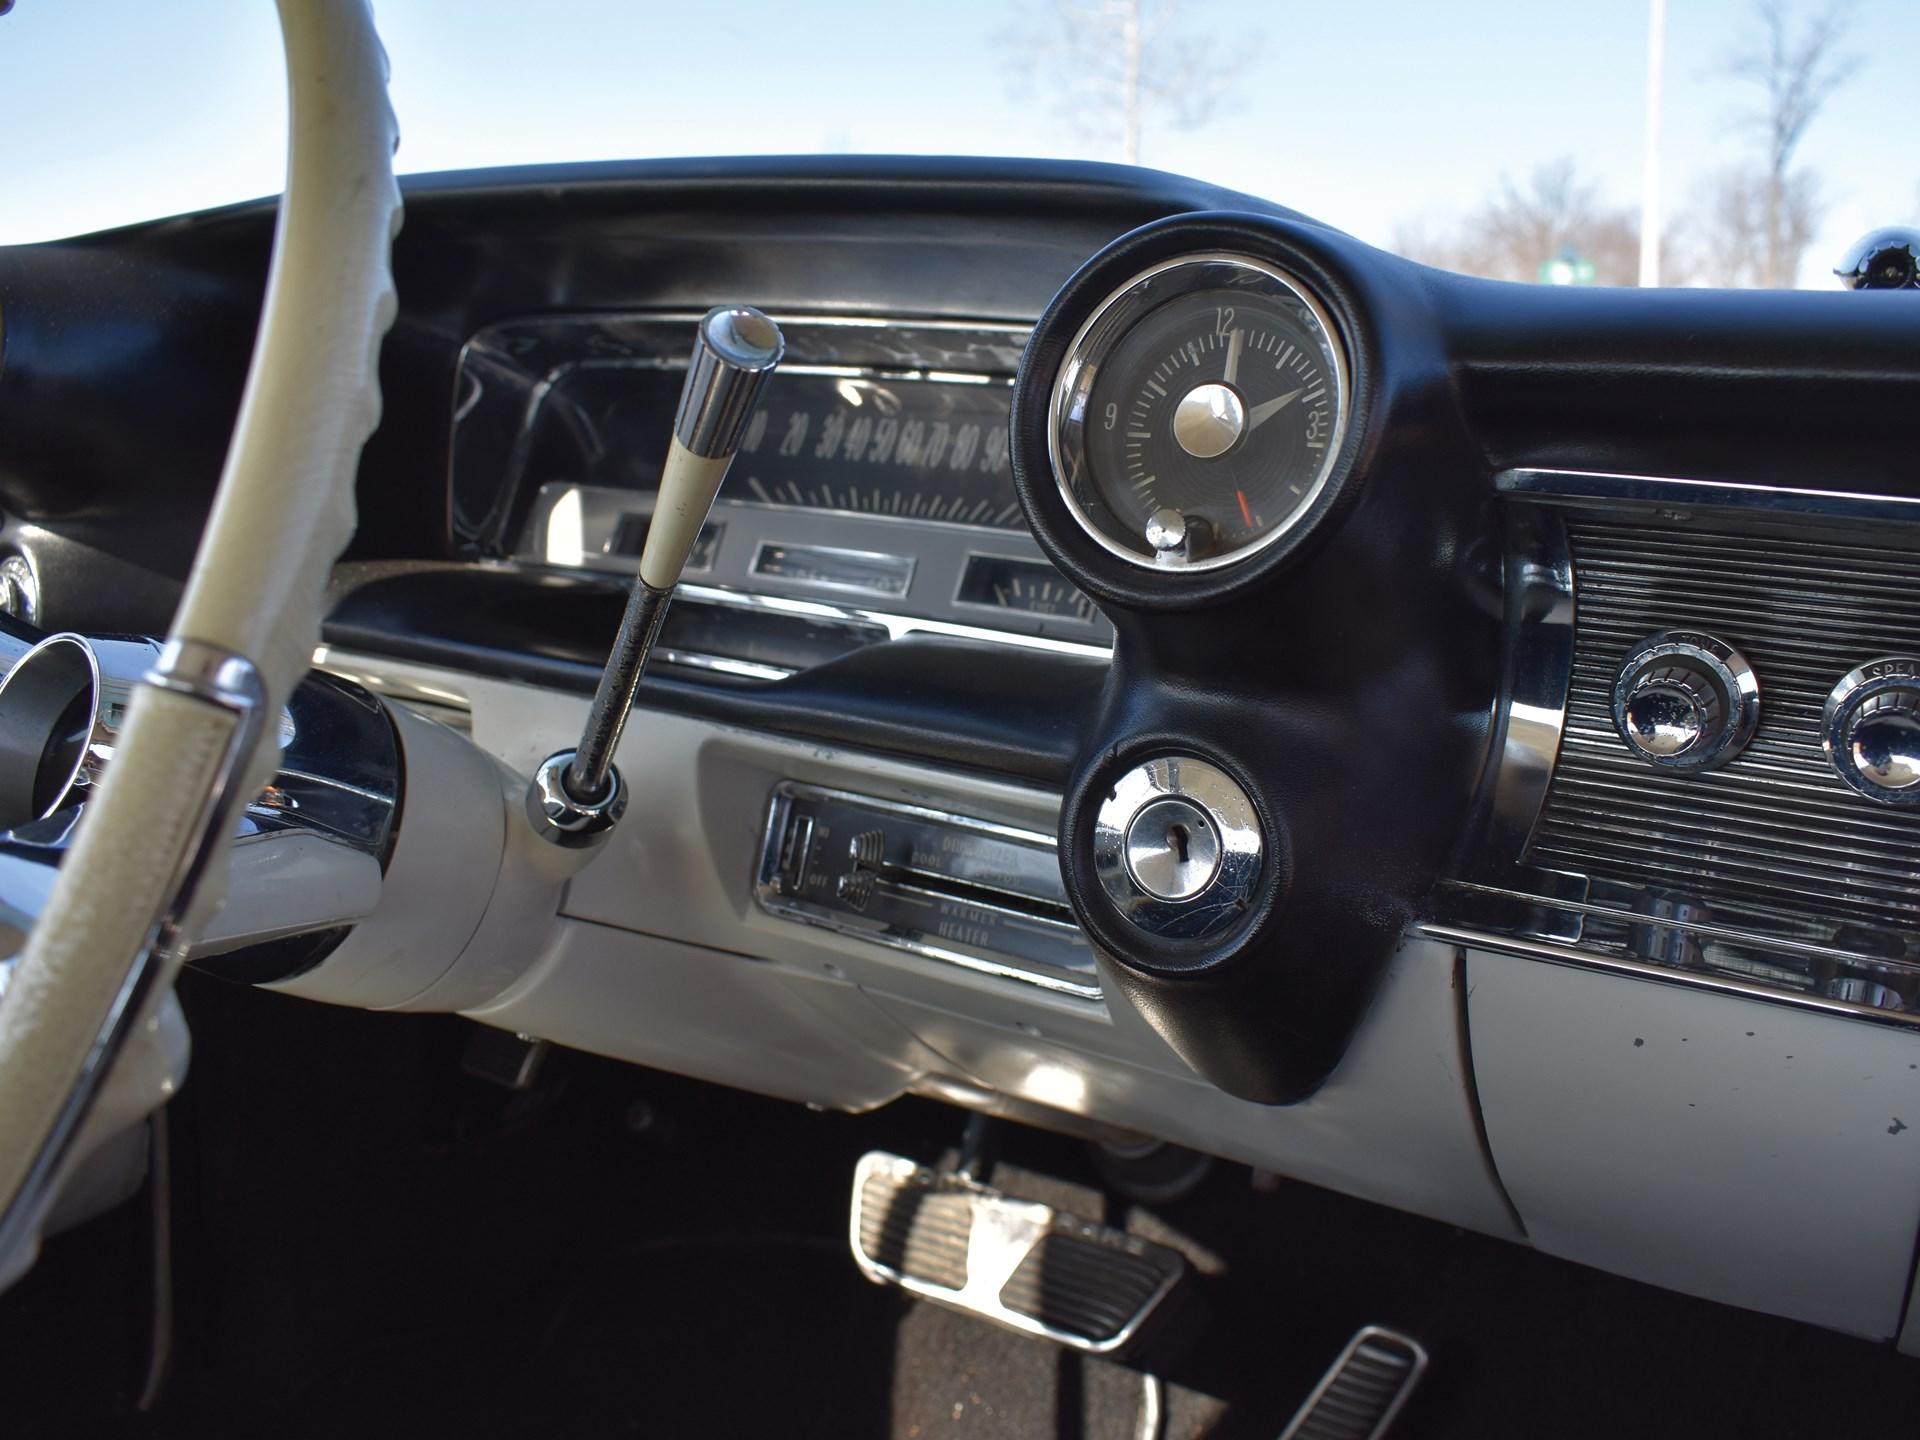 RM Sotheby's - 1960 Cadillac Fleetwood Sixty Special | Auburn Fall 2018